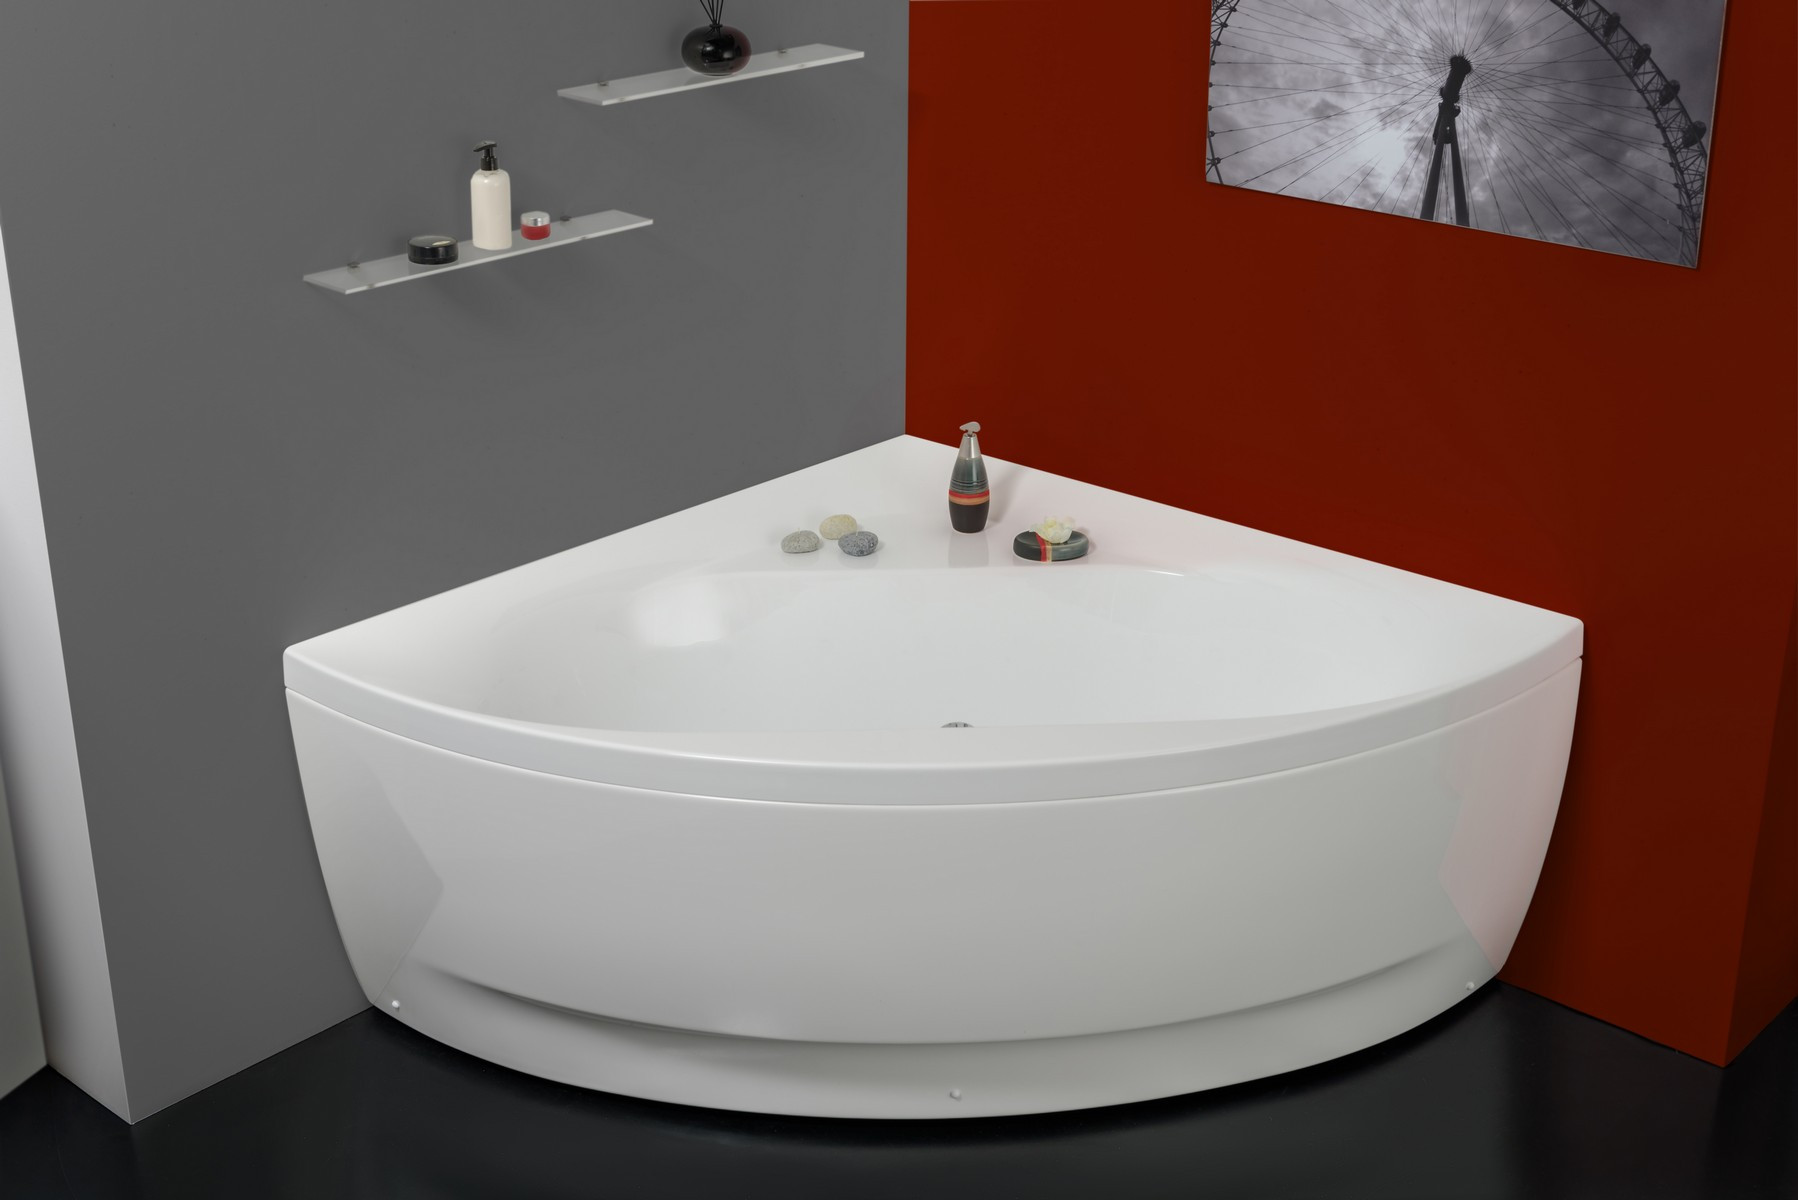 Aquatica Oliv-Wht Triangular Freestanding Acrylic Bathtub in White